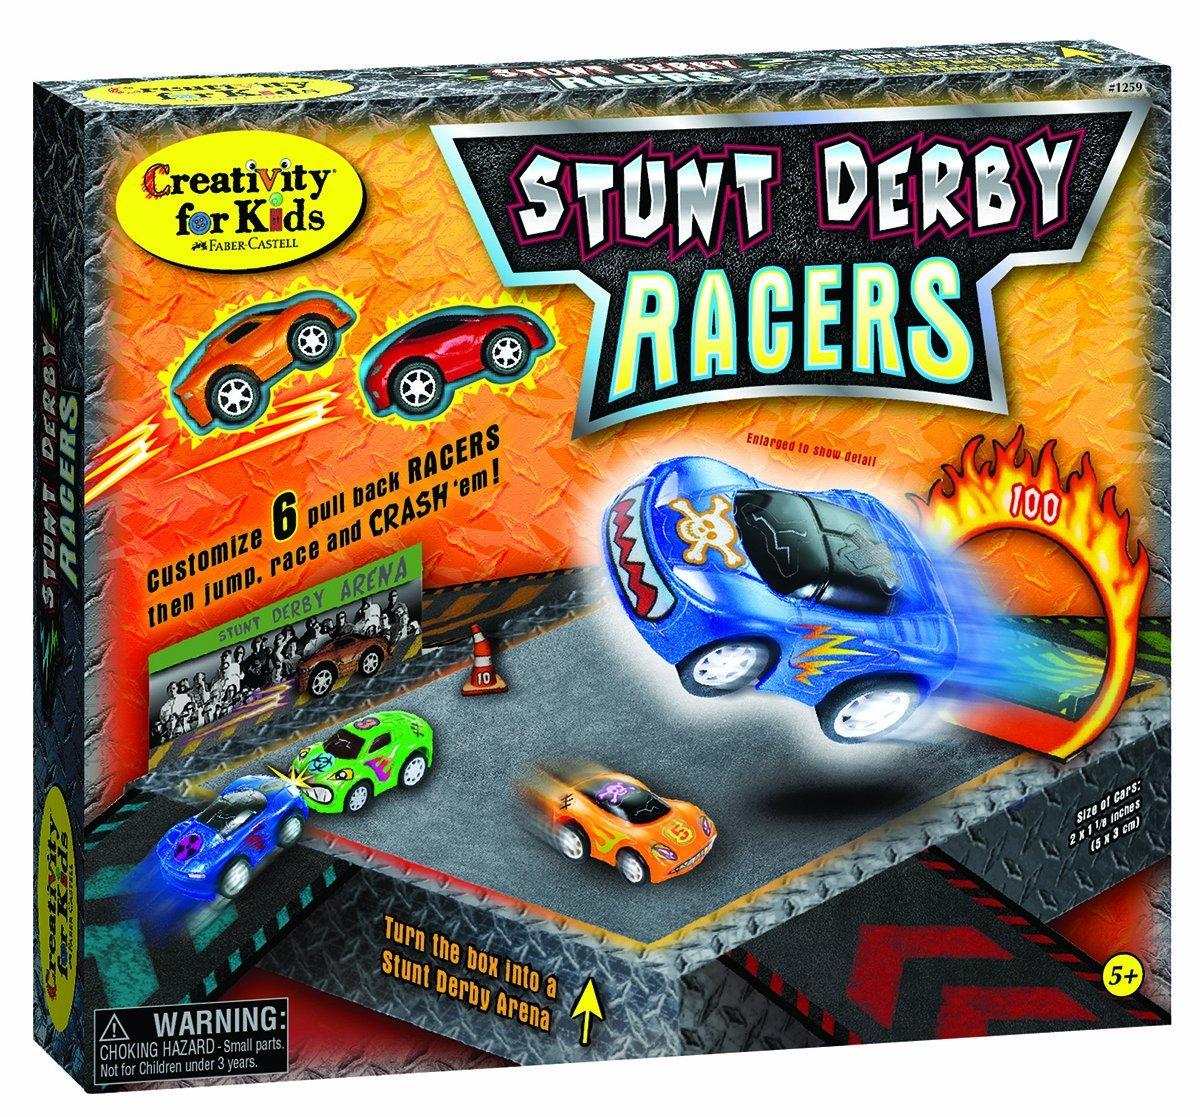 Stunt Derby Racers